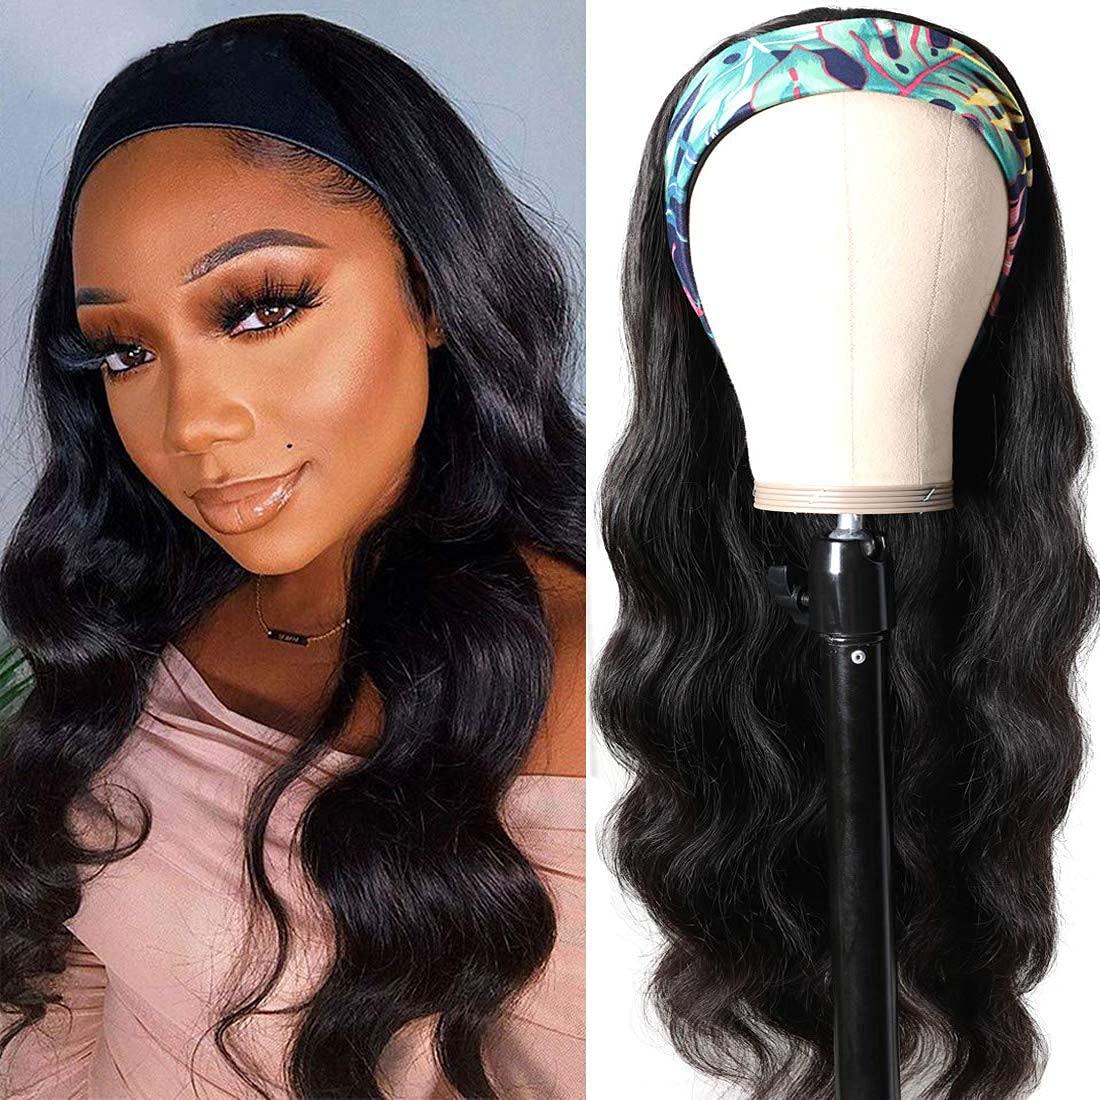 Julia Headband Human Hair Wigs Max 73% Ranking TOP8 OFF Body Wavy Glueless for Wave Women